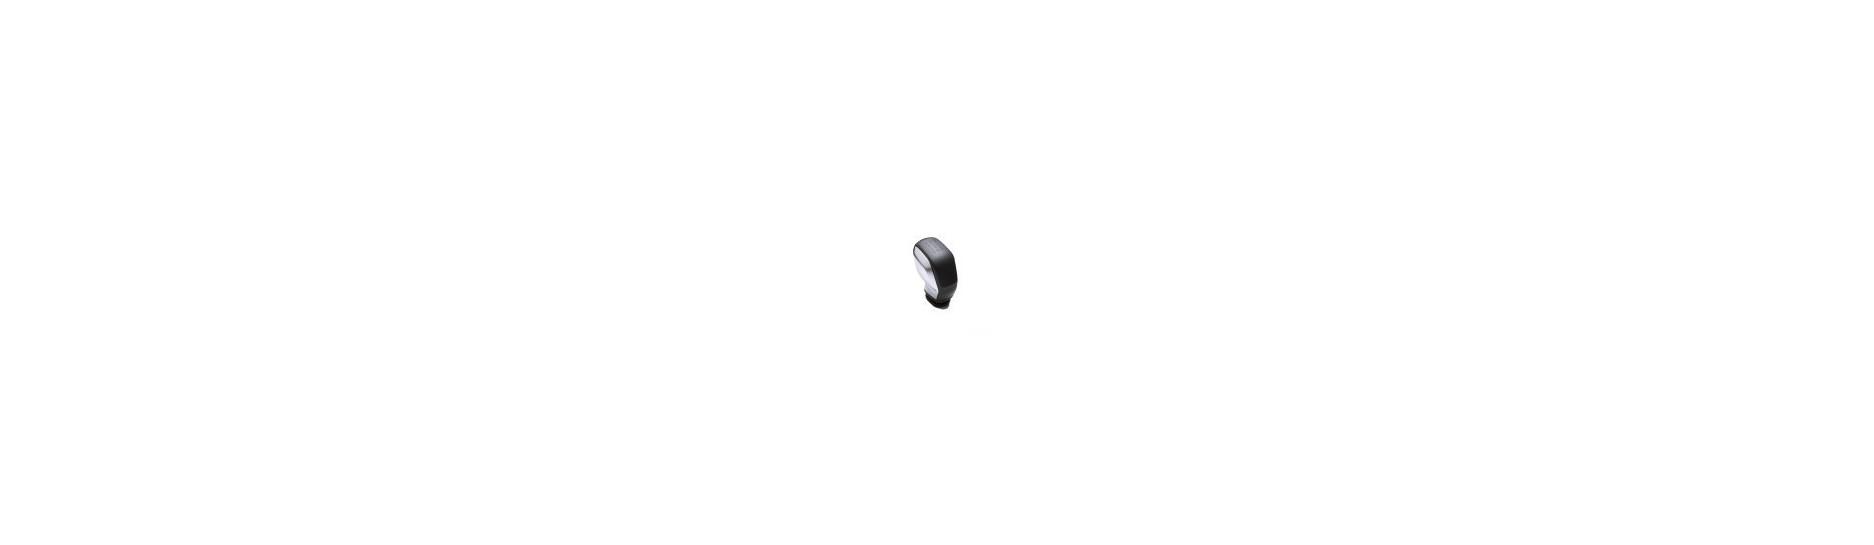 Gear knobs Peugeot